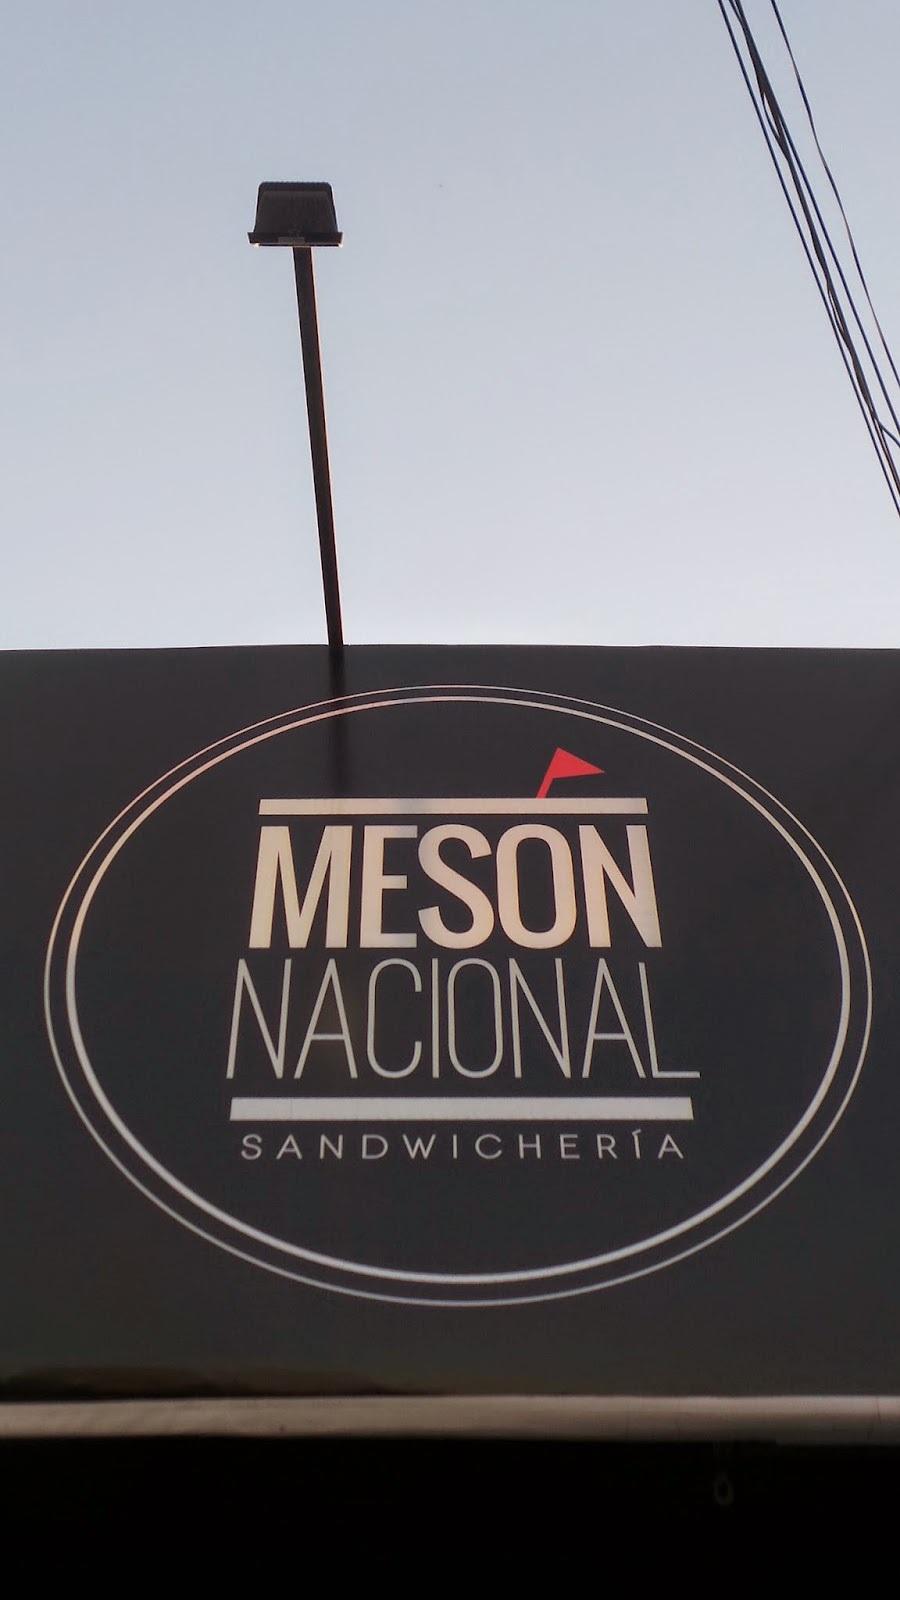 Meson Nacional: Sandwicheria de esas con cariño!